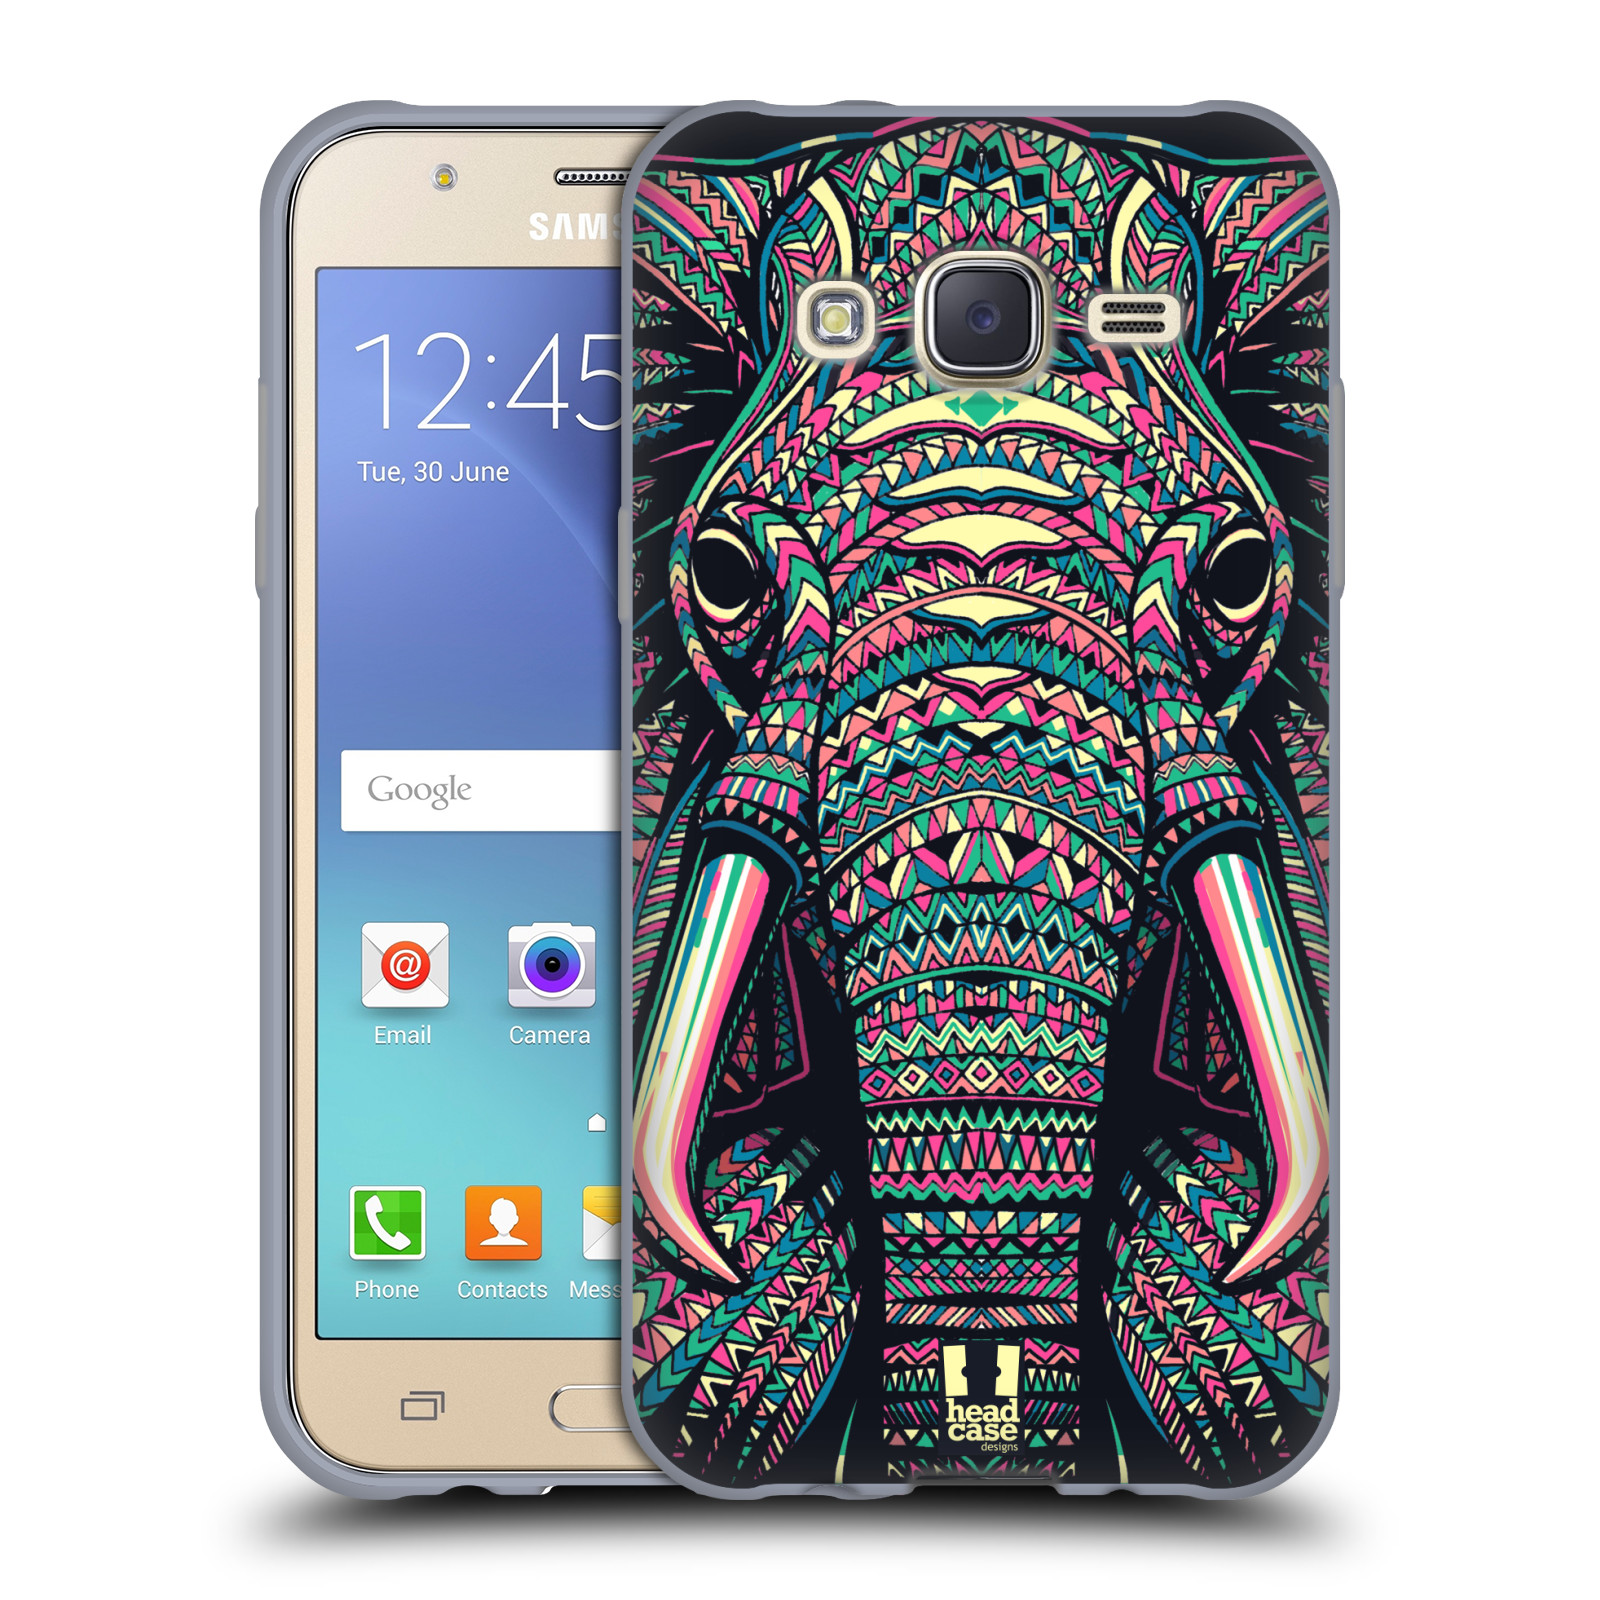 HEAD CASE silikonový obal na mobil Samsung Galaxy J5, J500, (J5 DUOS) vzor Aztécký motiv zvíře 2 slon